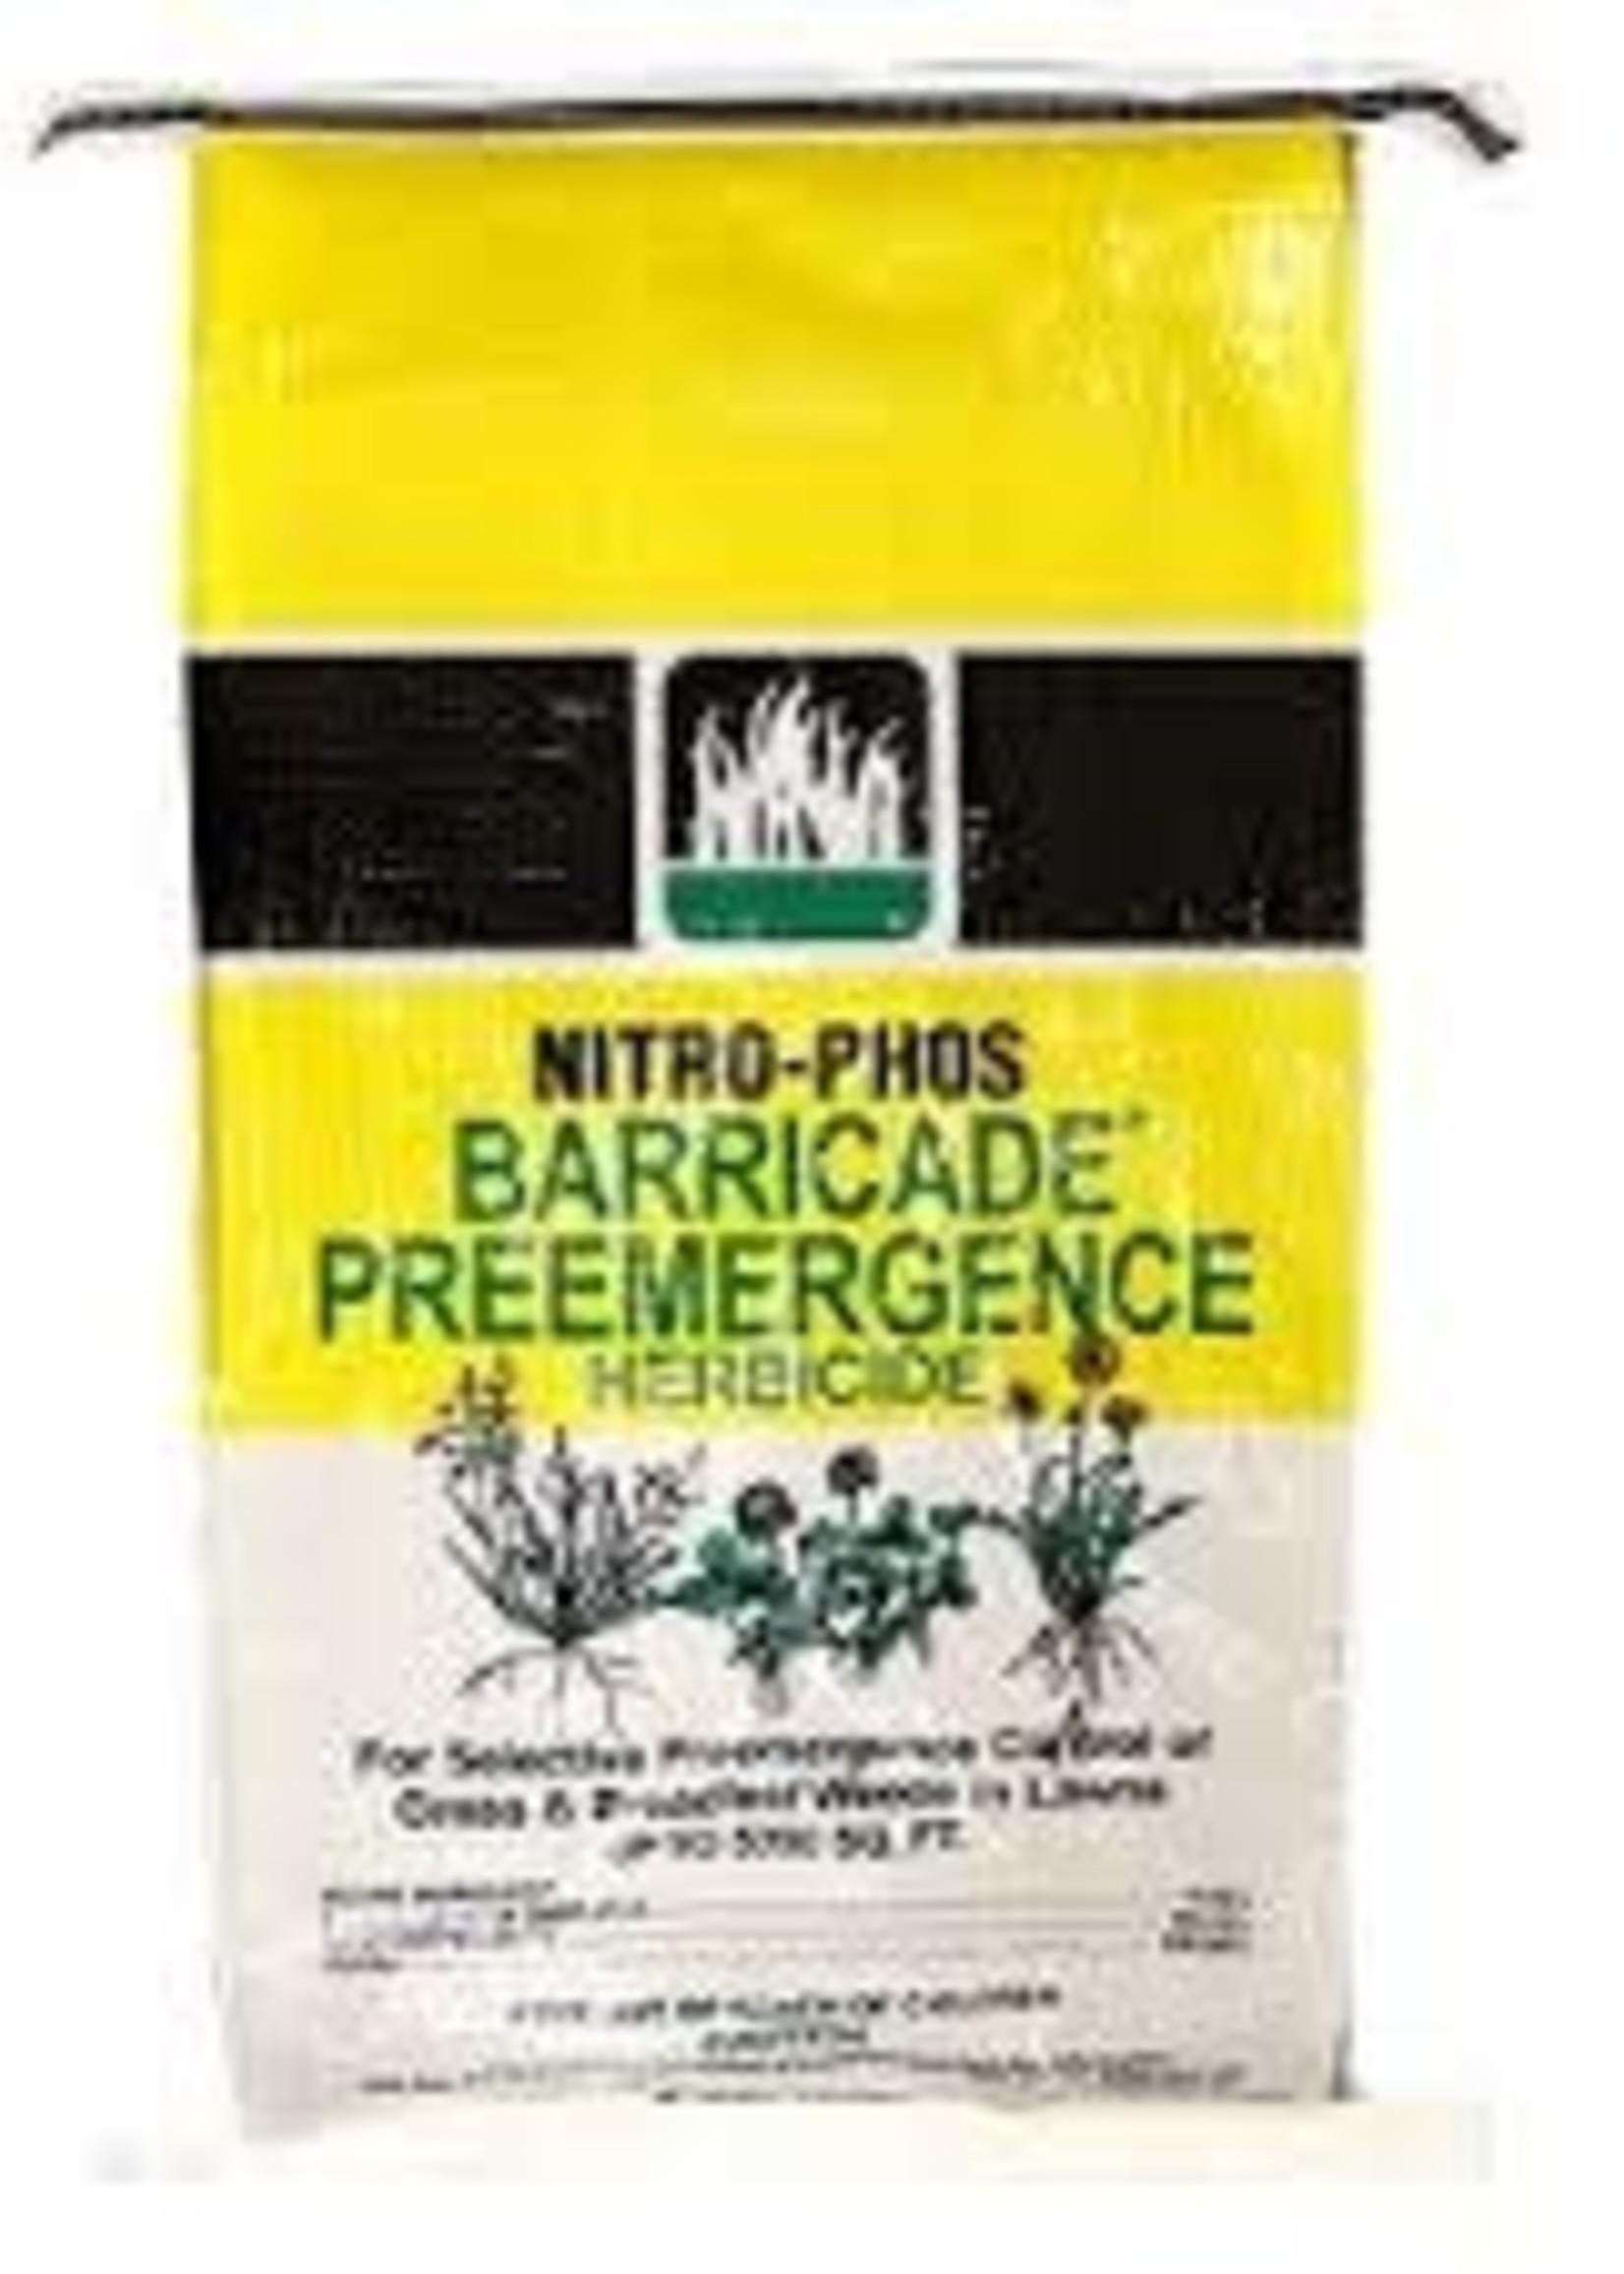 BAG Nitro Phos Barricade Pre-emergent 10 lb. 2500 SF Coverage